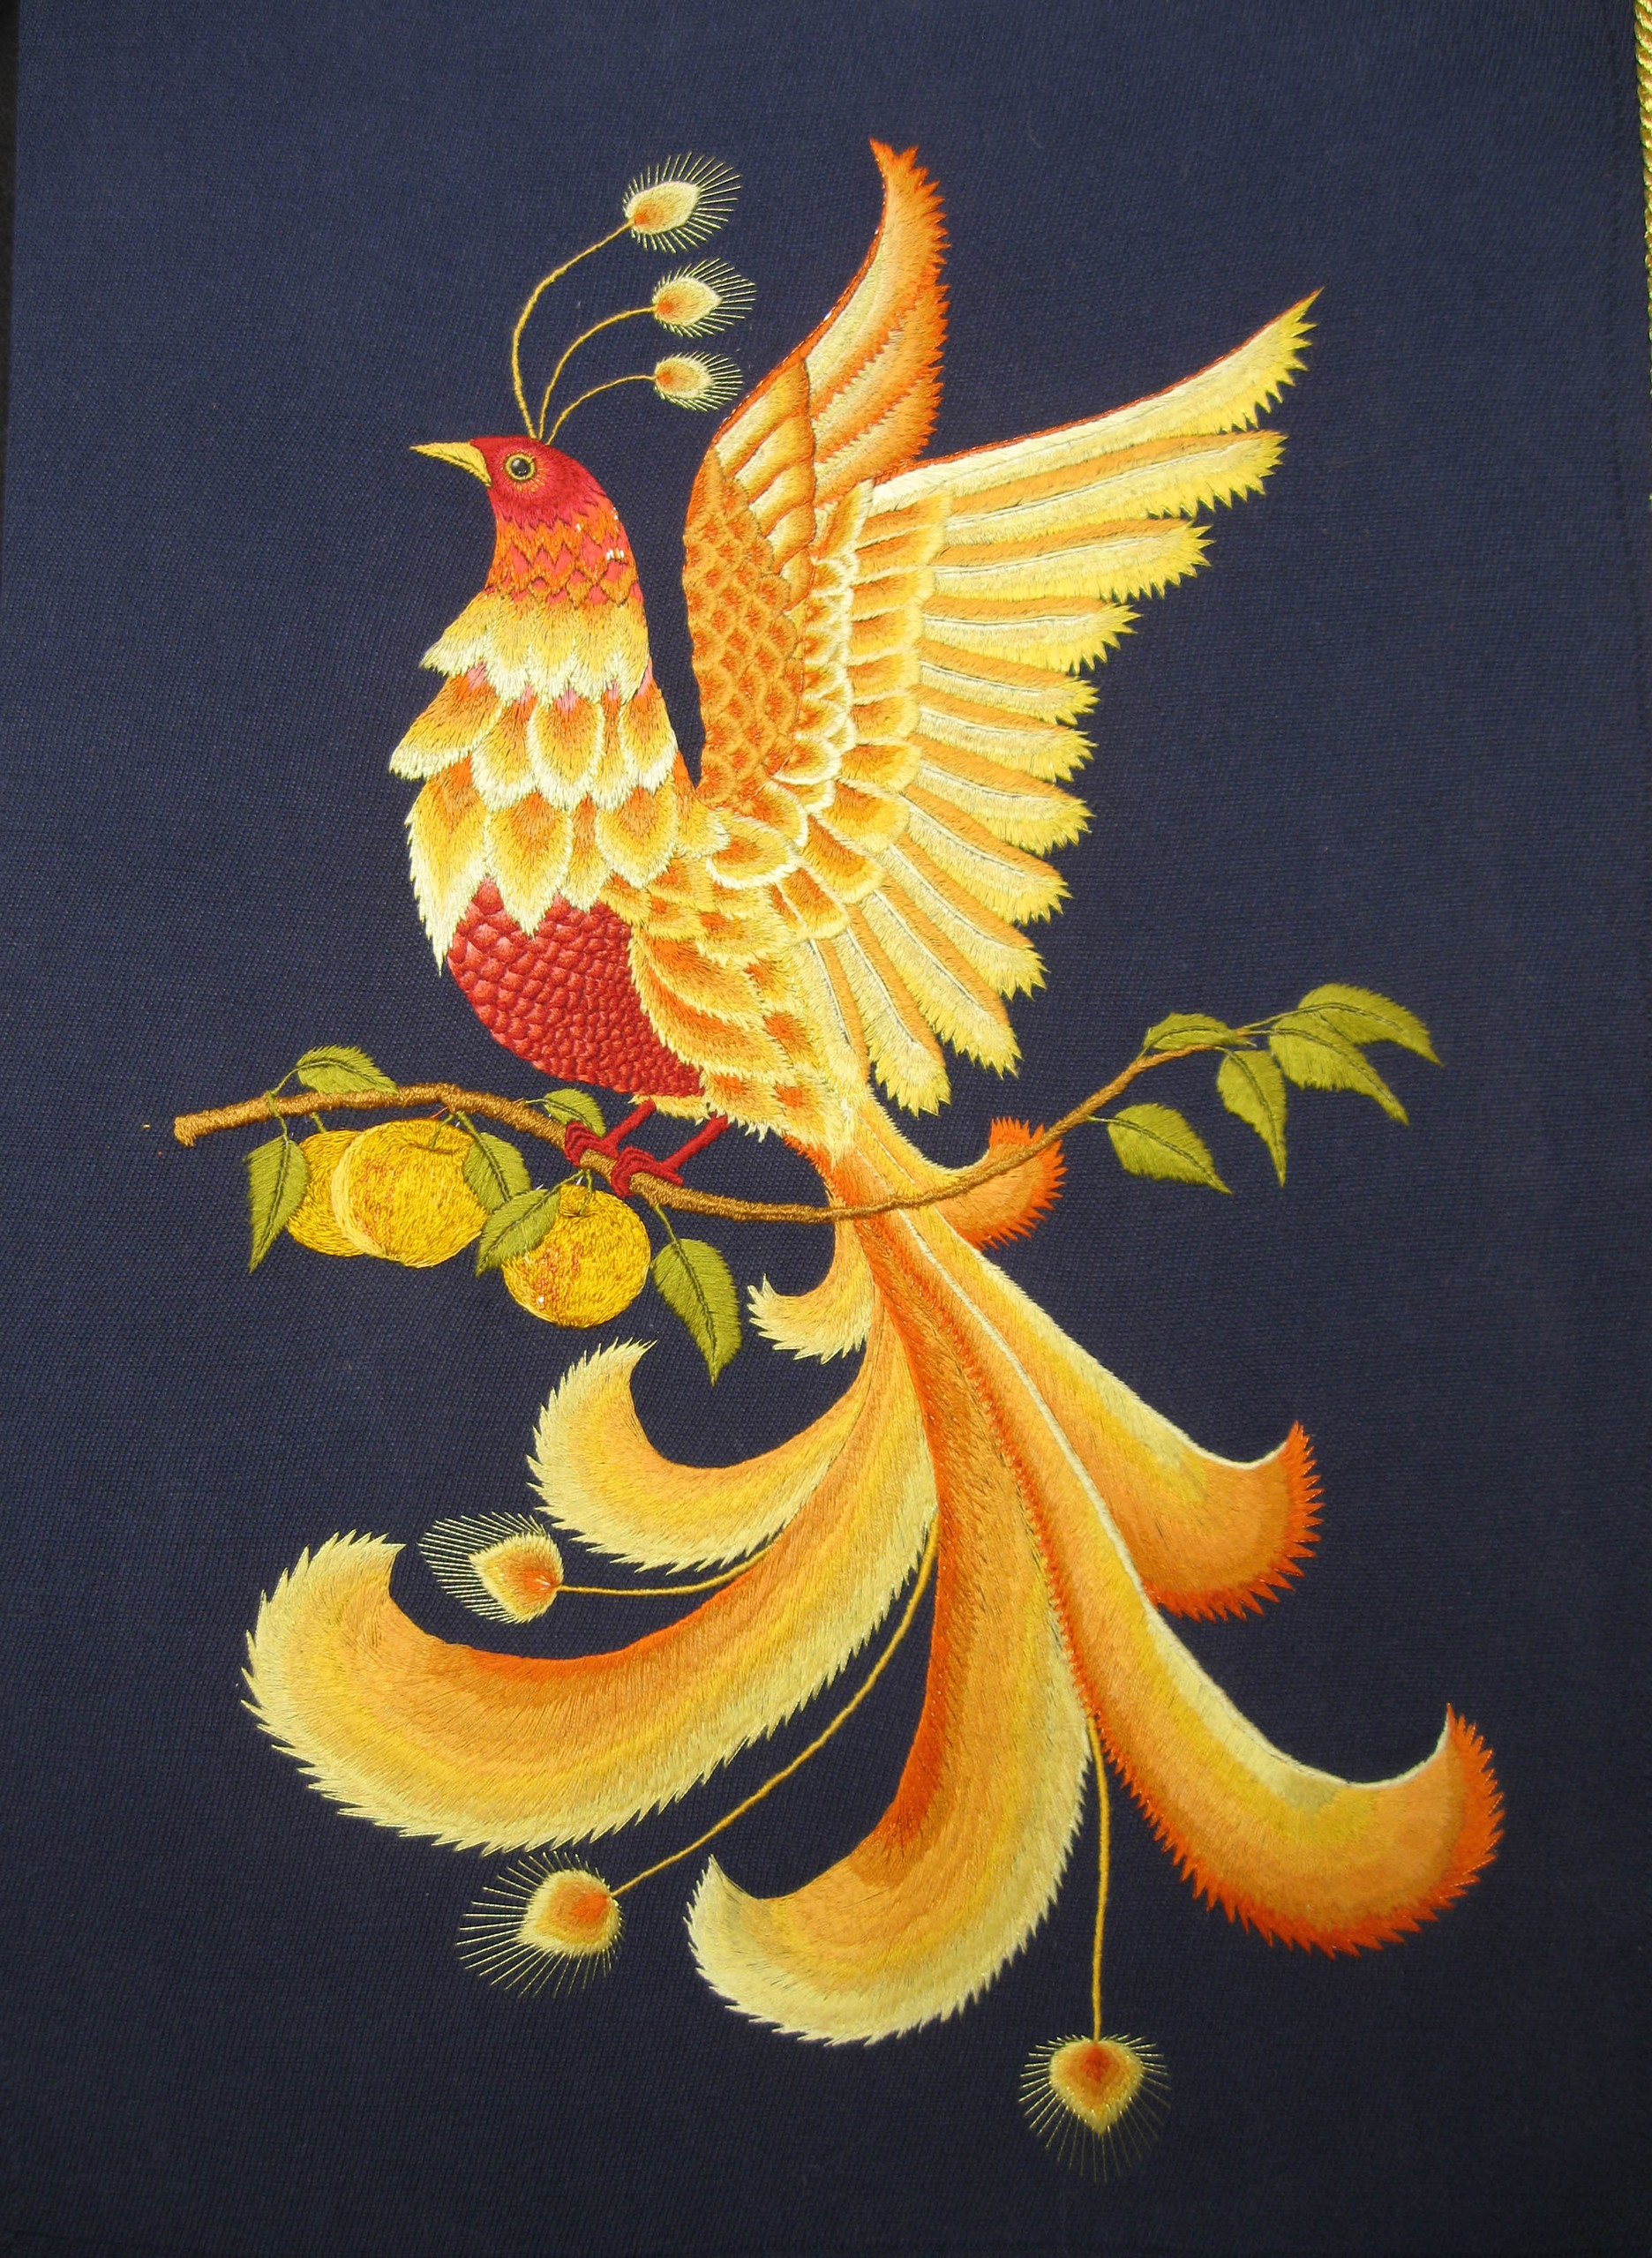 Жар птица сказка своими руками вышивка